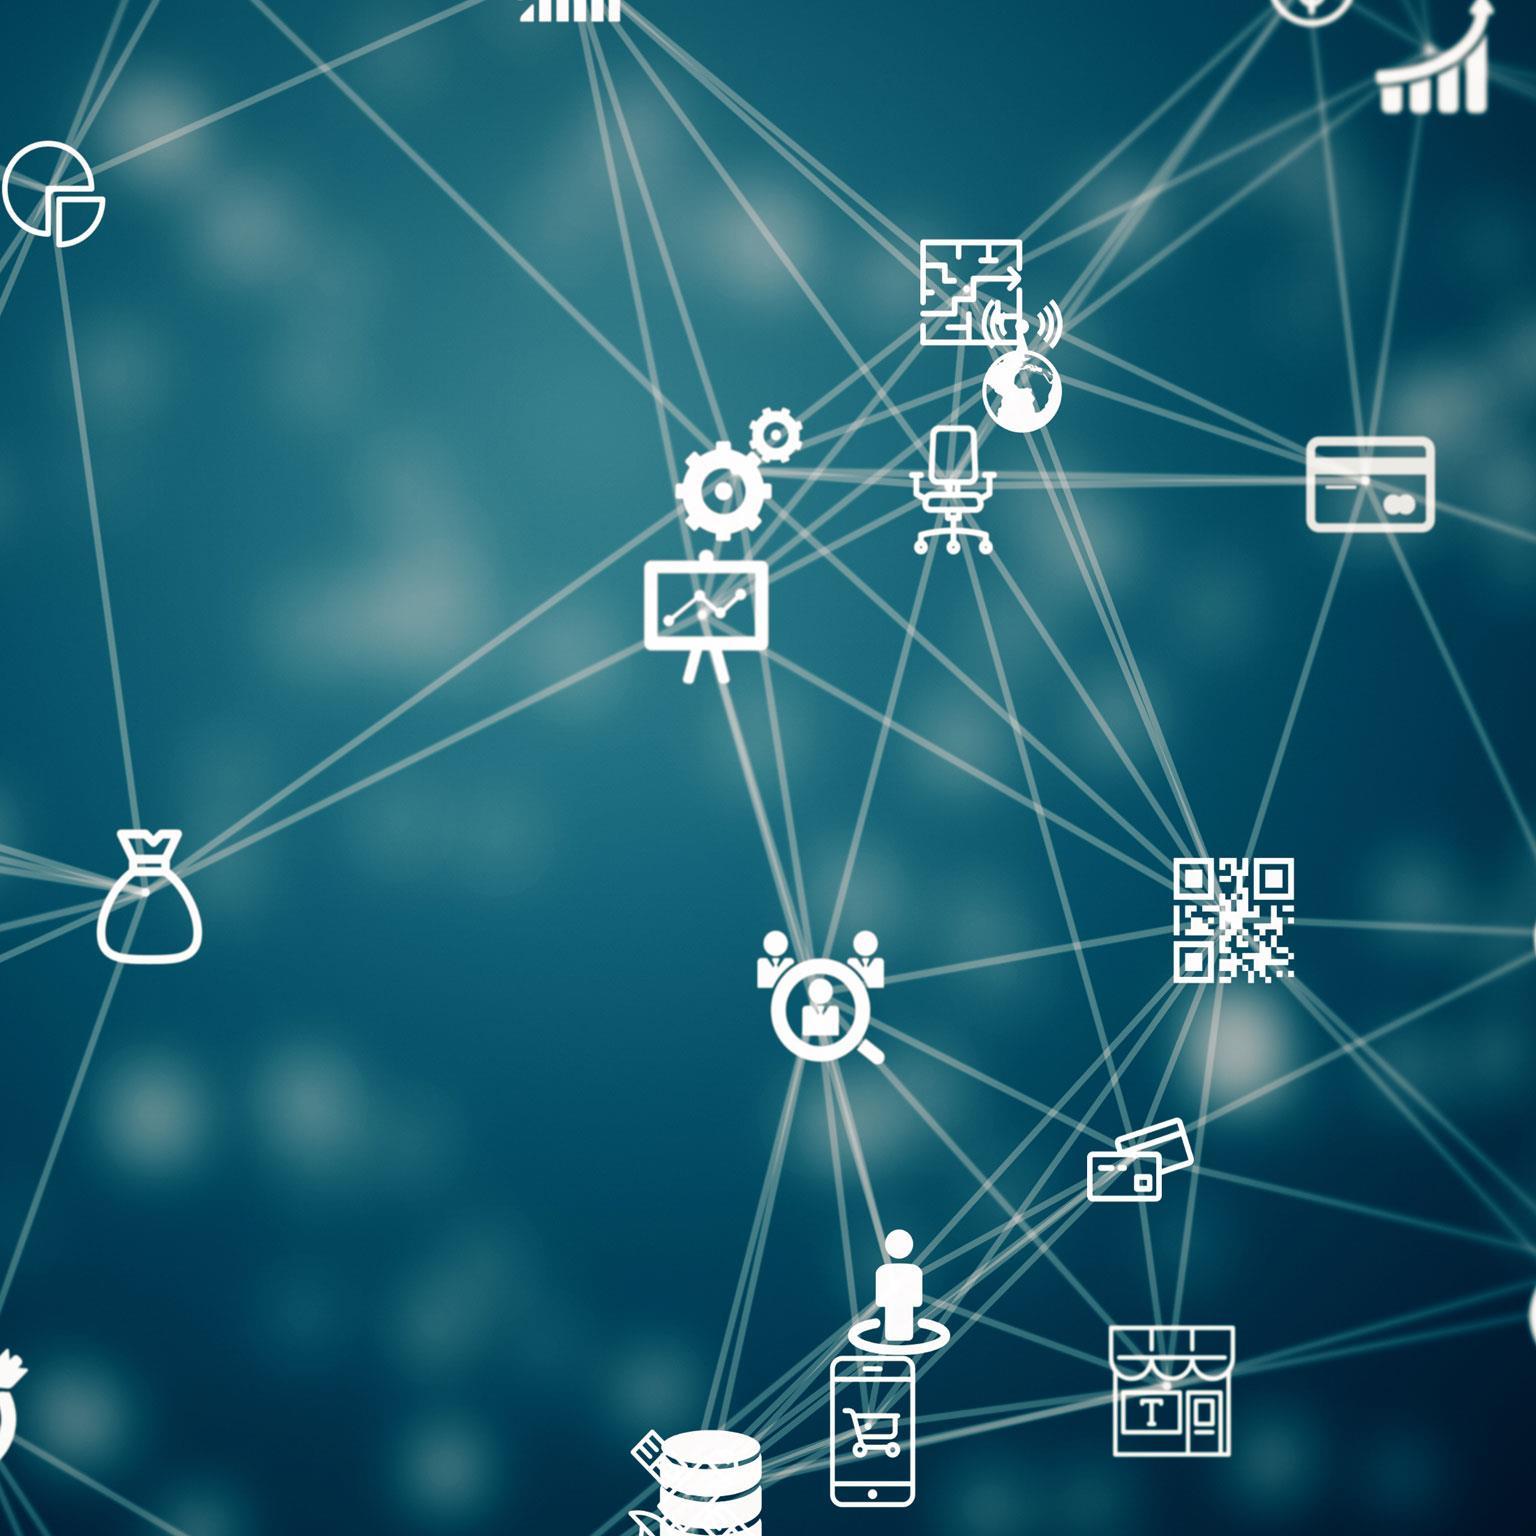 Making-sense-of-Internet-of-Things-platforms-1536x1536-100_Standard.ashx (1536×1536)